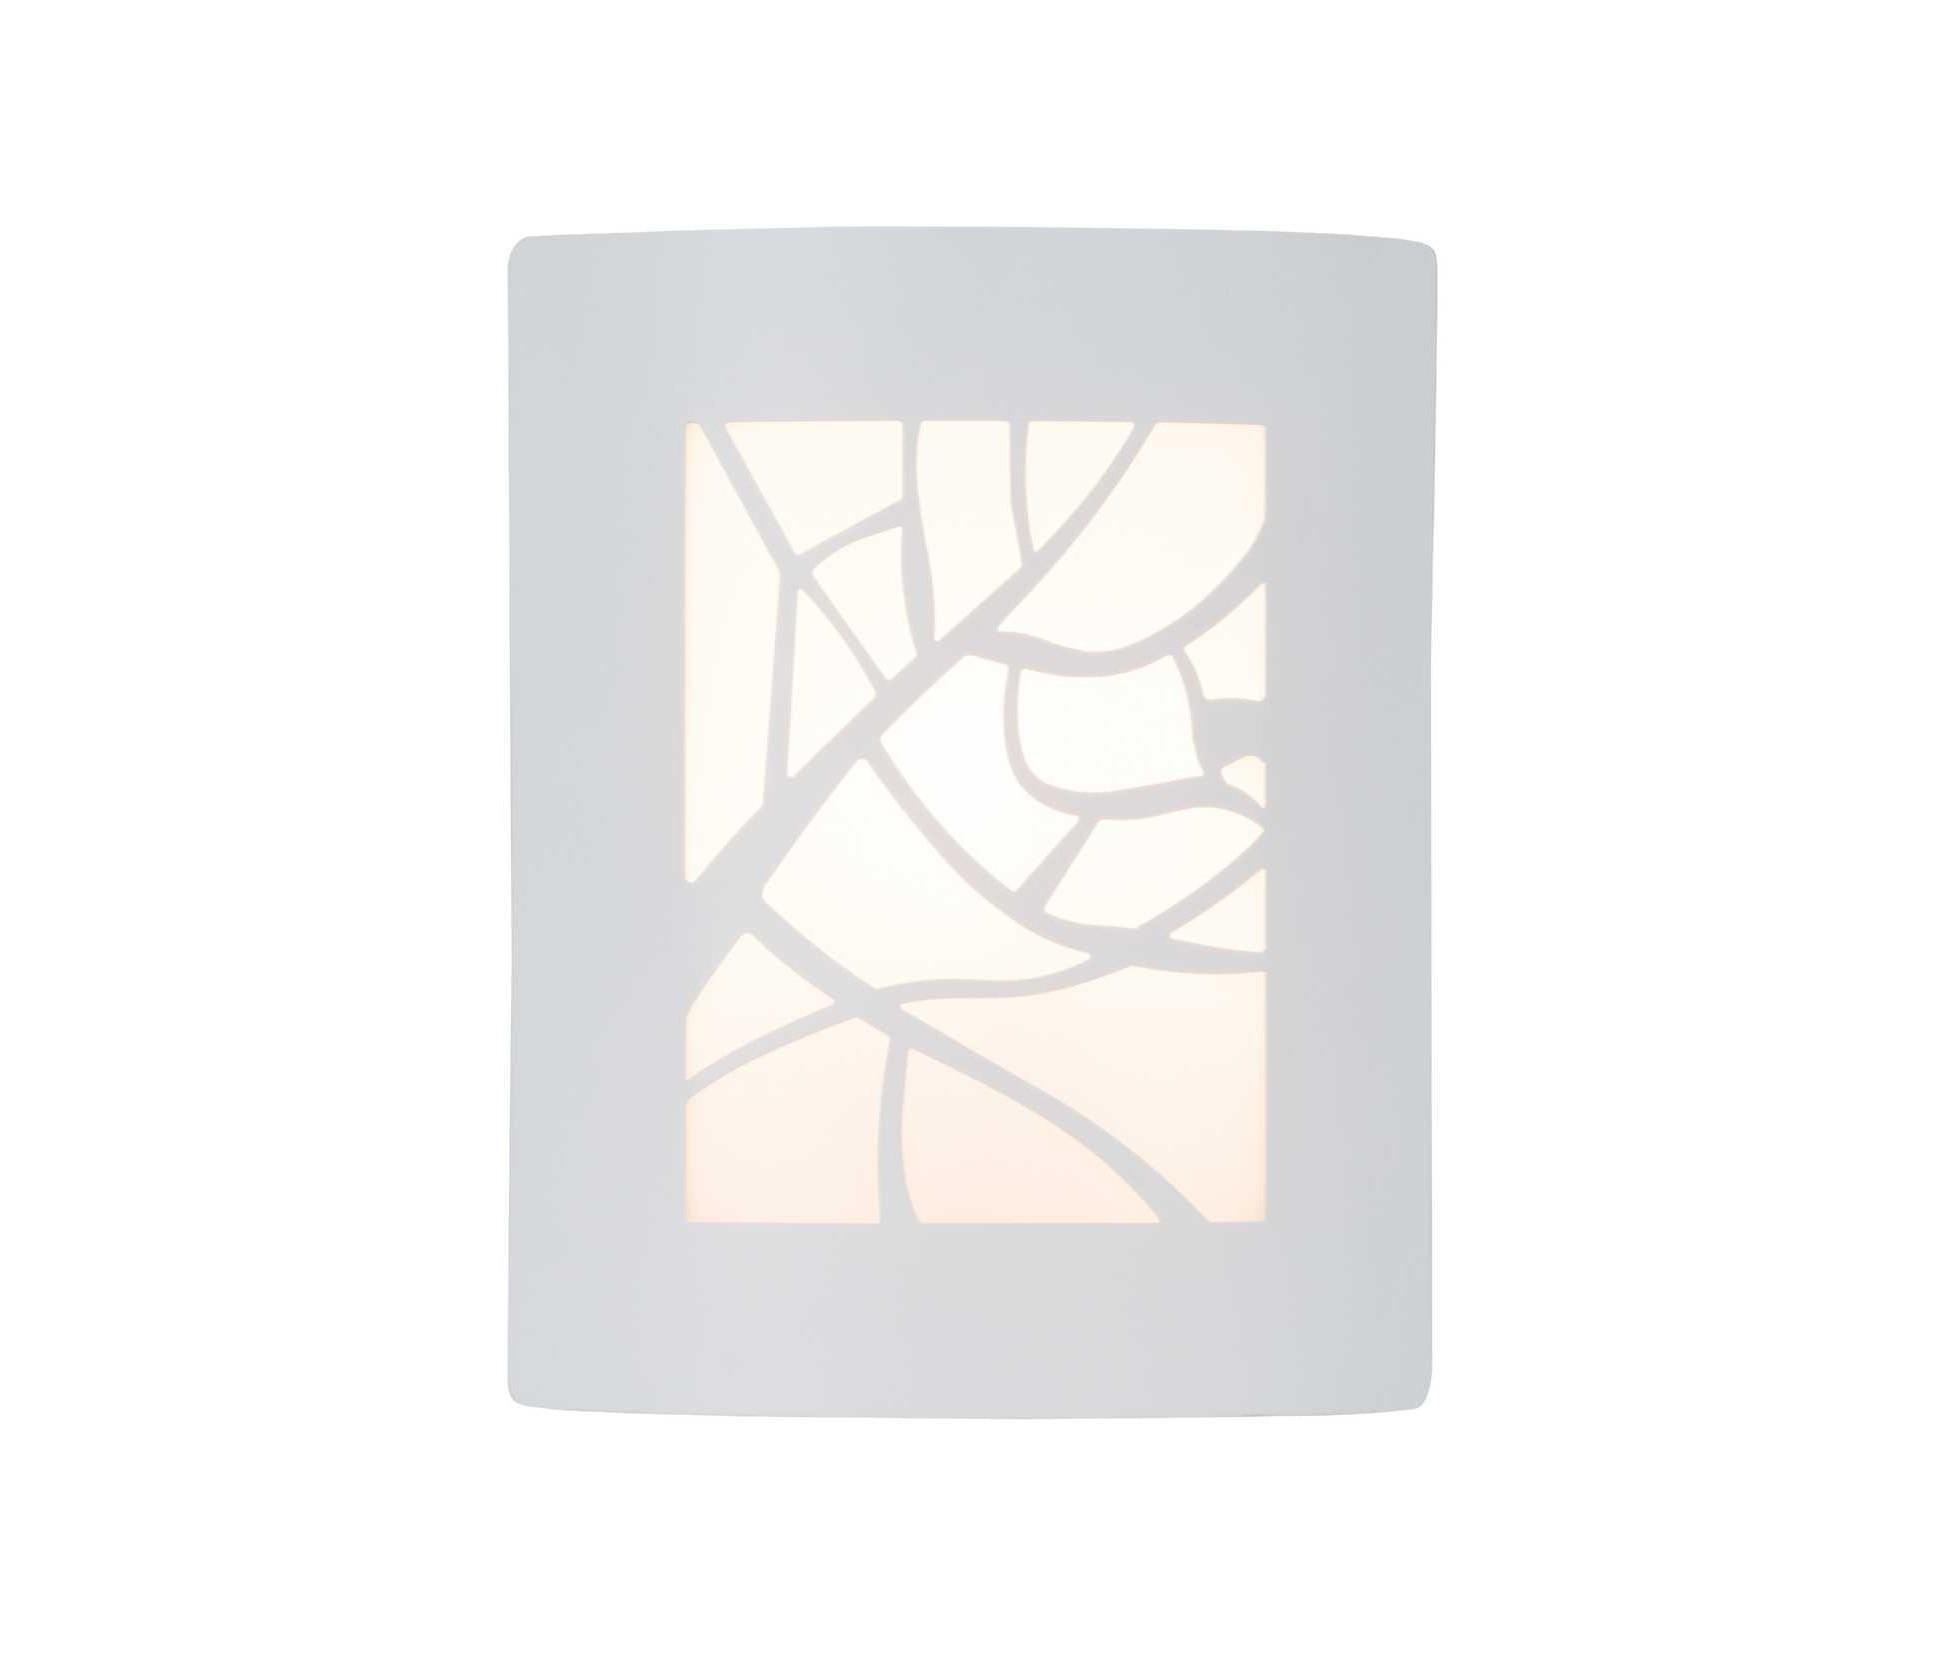 Светильник уличный WHITNEYУличные настенные светильники<br>&amp;lt;div&amp;gt;Тип цоколя: E27&amp;lt;/div&amp;gt;&amp;lt;div&amp;gt;Мощность лампы: 60W&amp;lt;/div&amp;gt;&amp;lt;div&amp;gt;Количество ламп: 1&amp;lt;/div&amp;gt;&amp;lt;div&amp;gt;Наличие ламп: нет&amp;lt;/div&amp;gt;<br><br>Material: Пластик<br>Width см: 23<br>Depth см: 9<br>Height см: 29